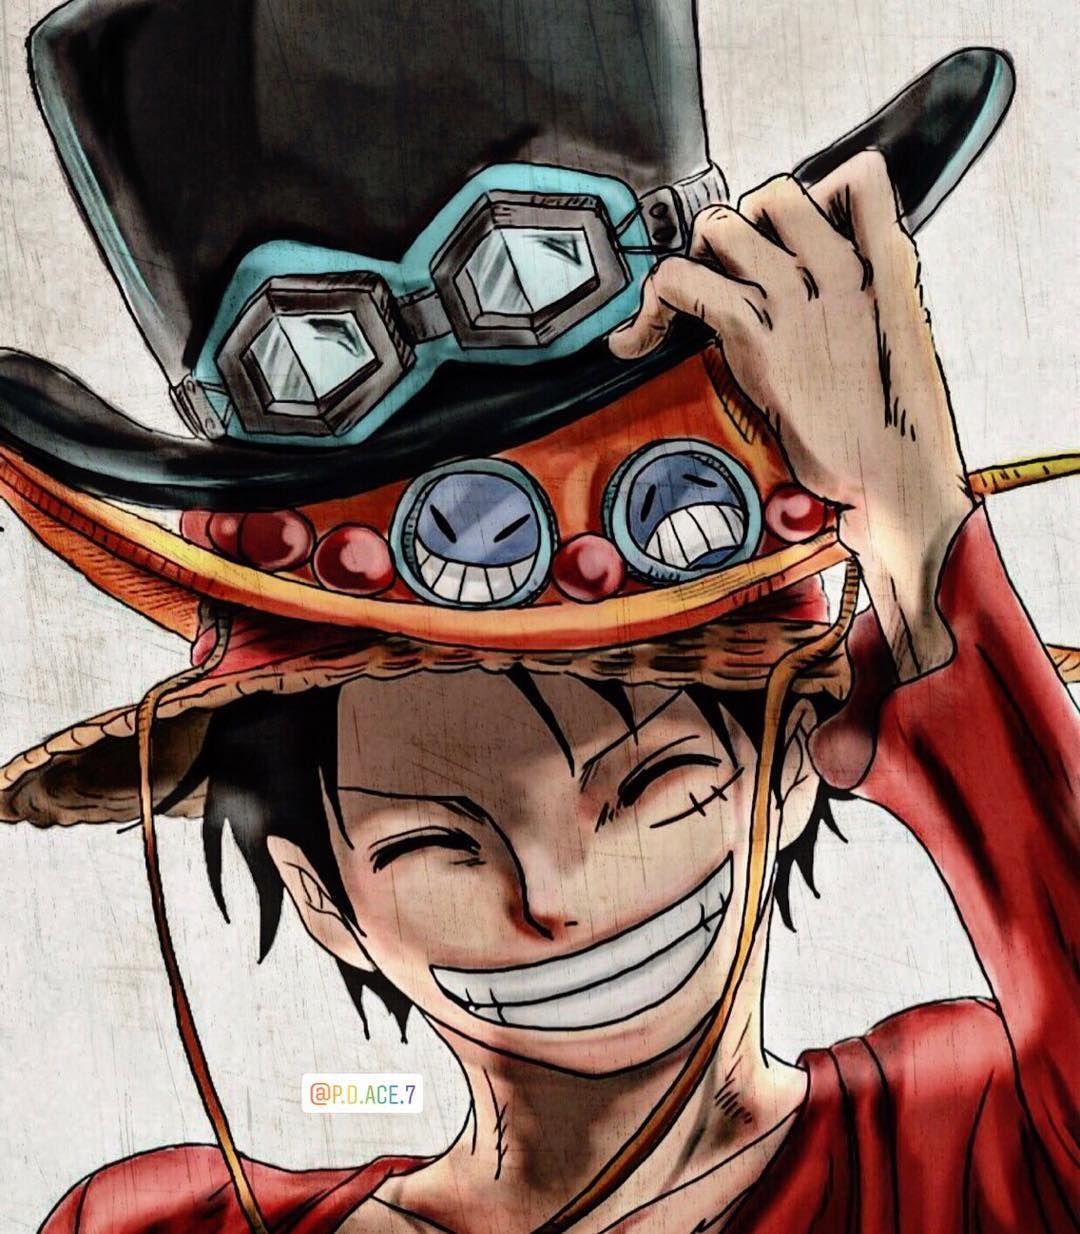 Pin By Abdoo77 On فن Manga Anime One Piece Anime Drawings Boy Anime